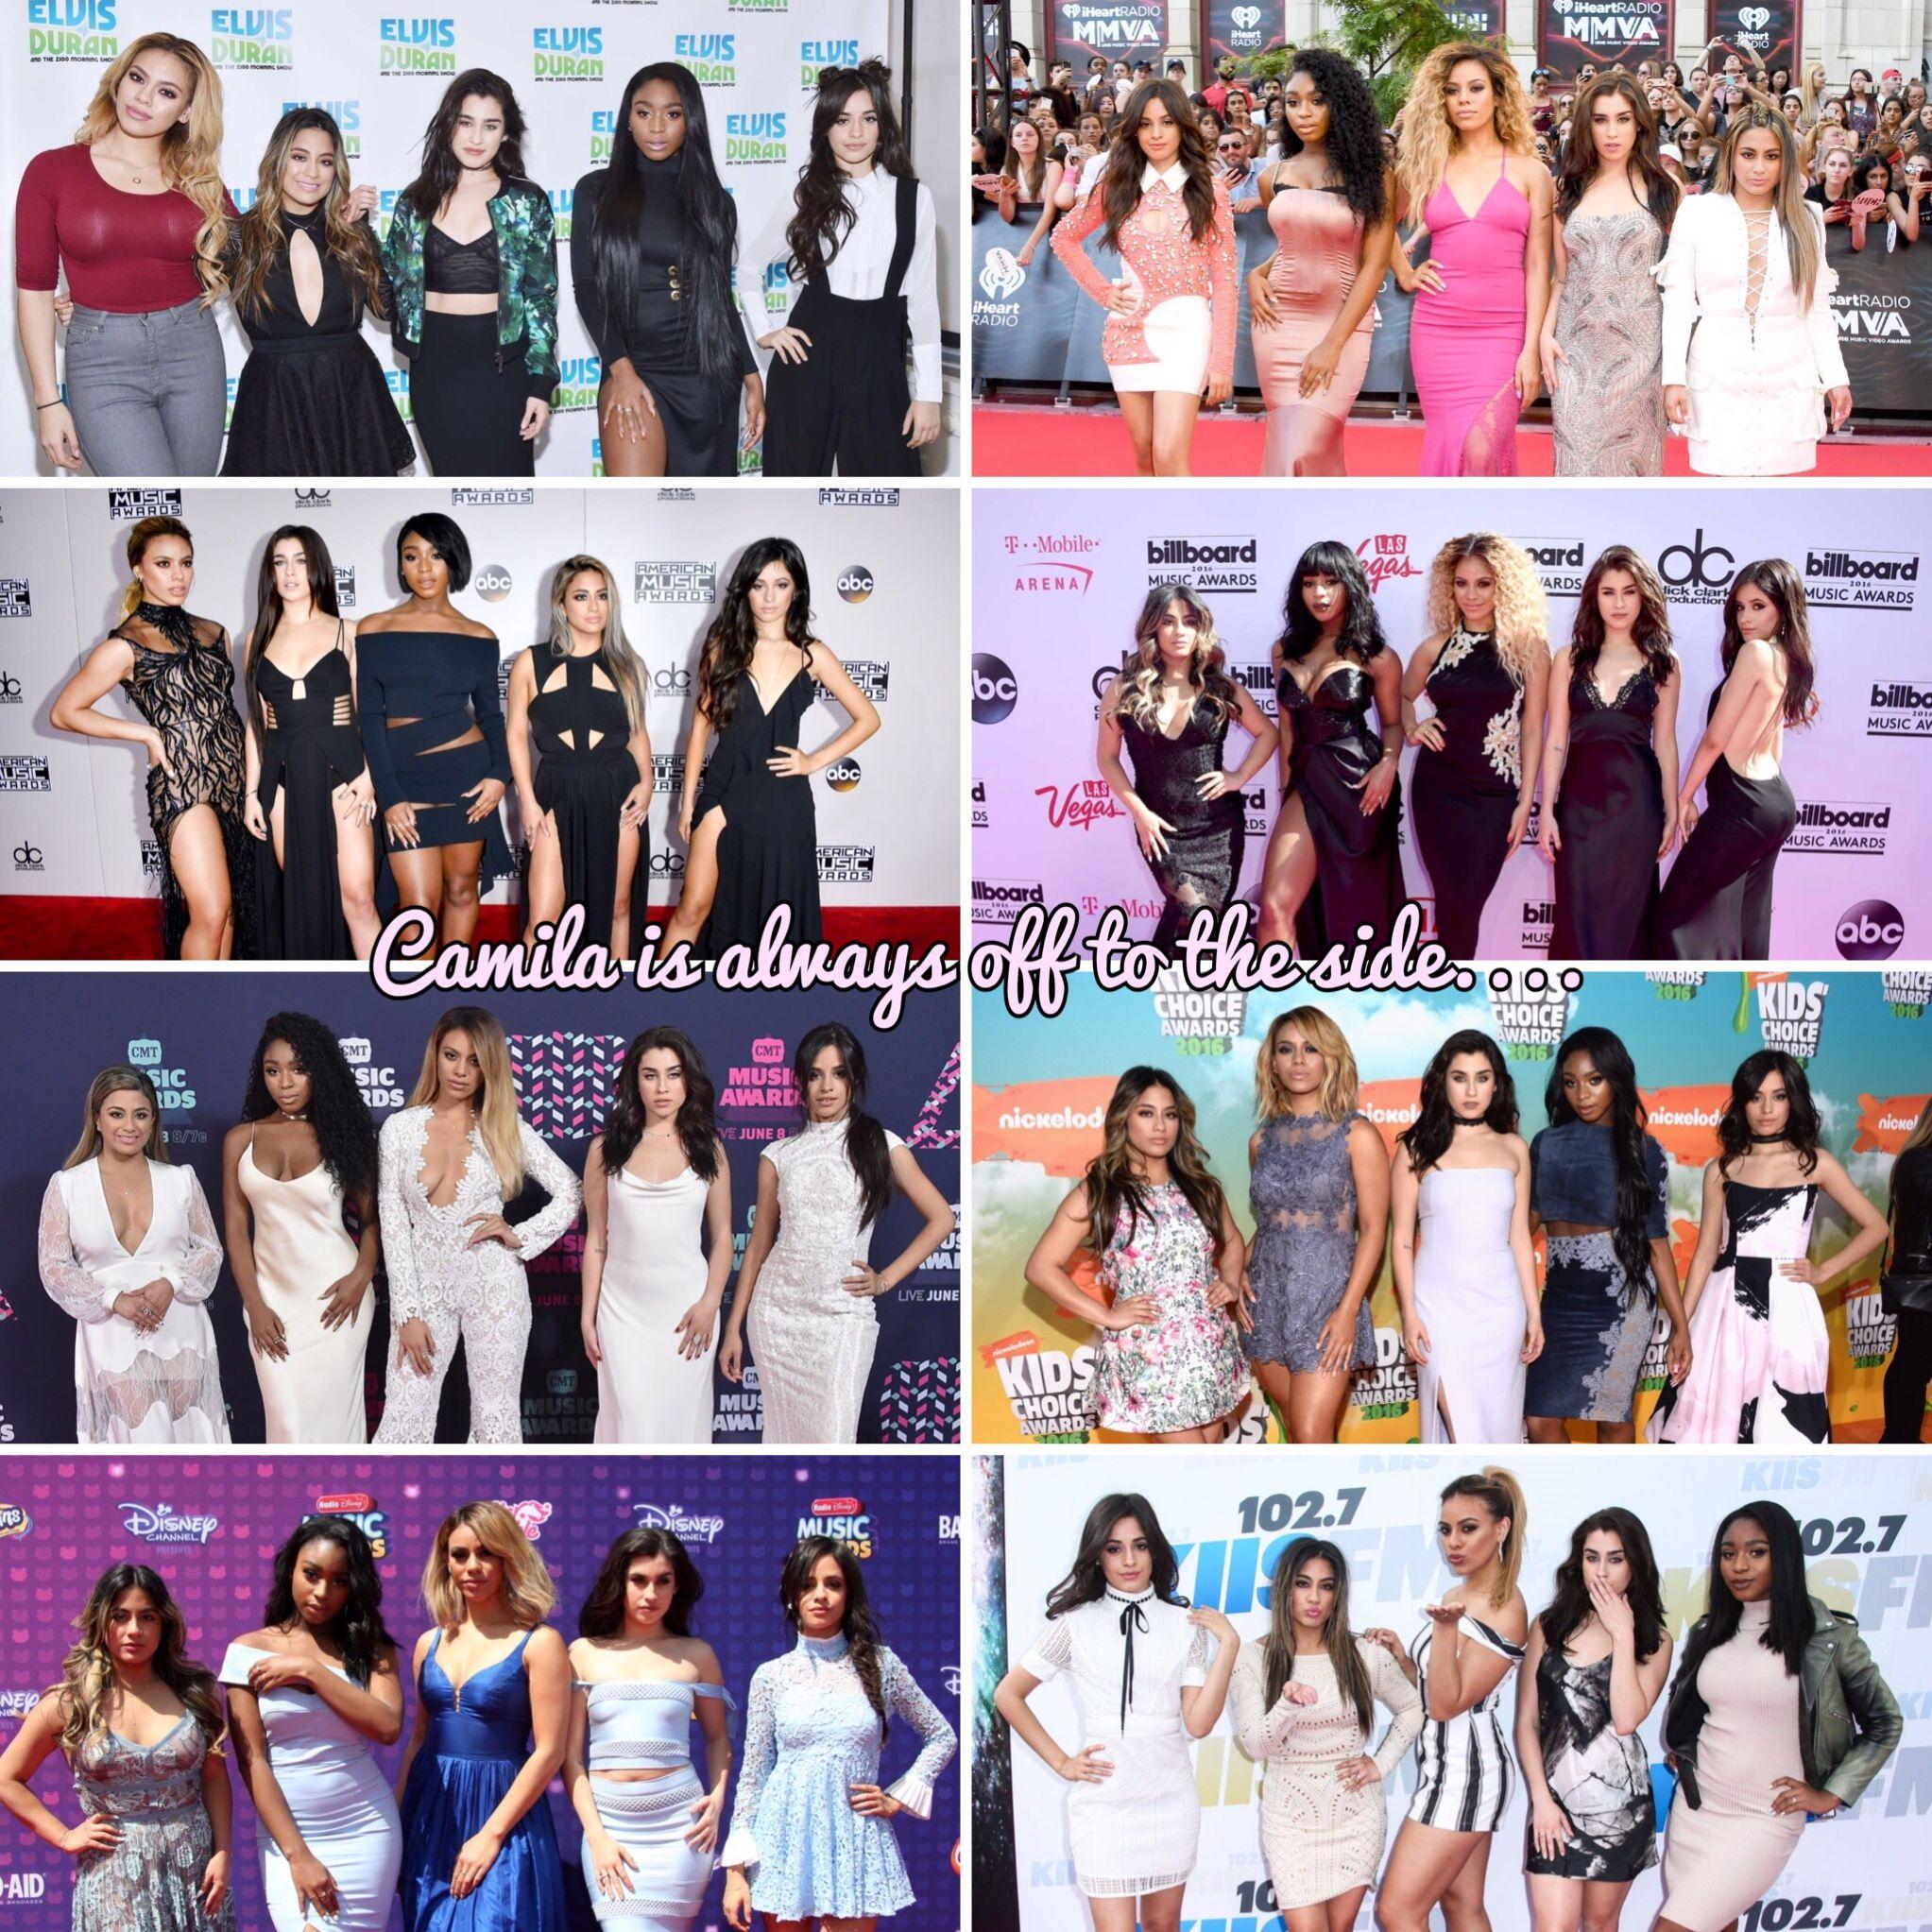 When Camila Cabello Left Fifth Harmony, Many People